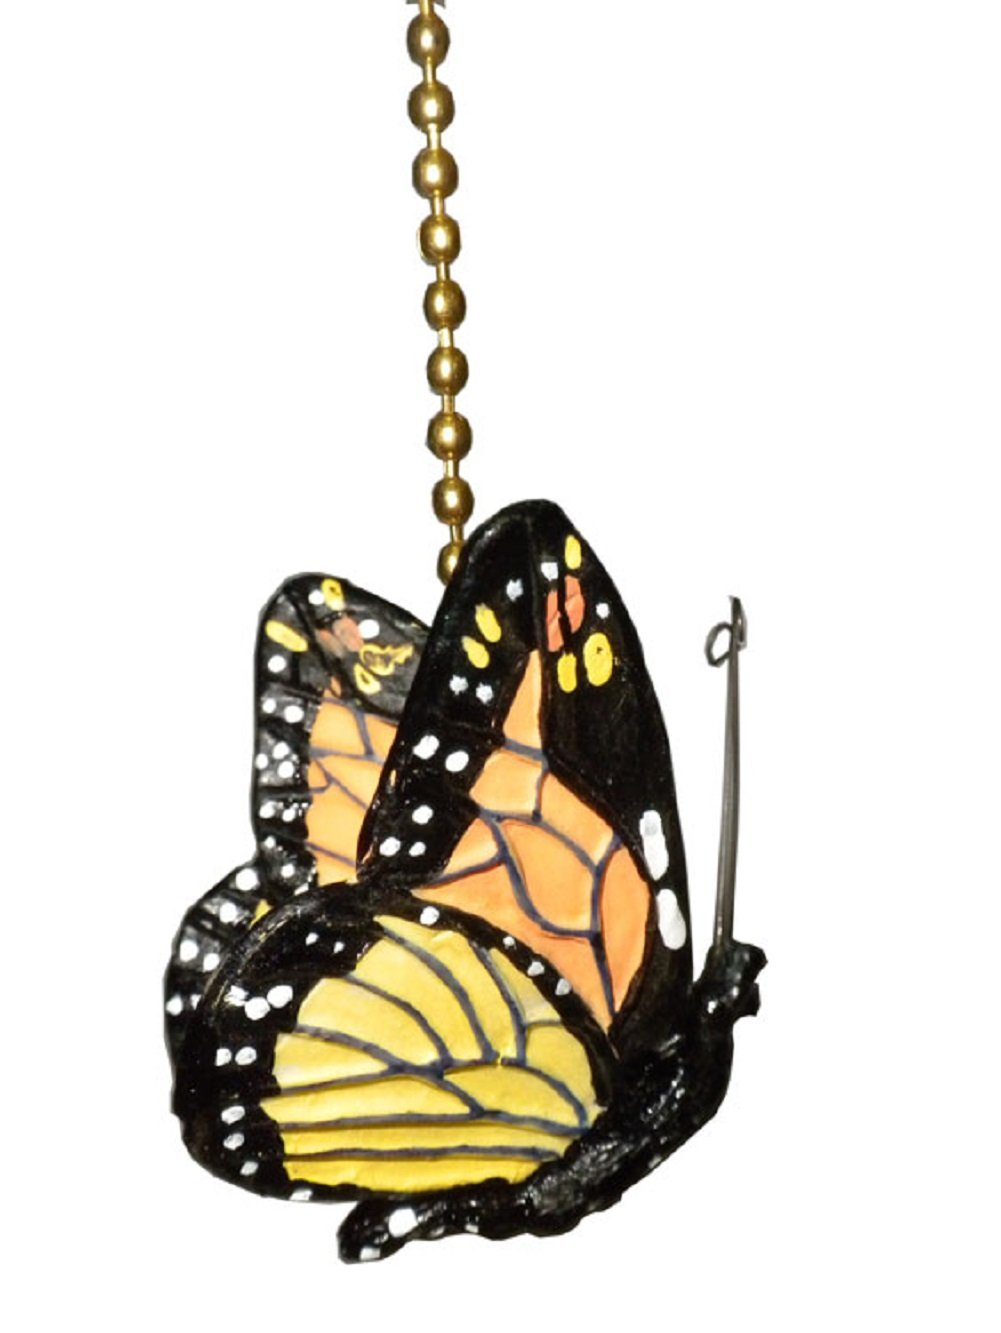 monarch Butterfly Ceiling Fan Pull Chain Ornament Decor